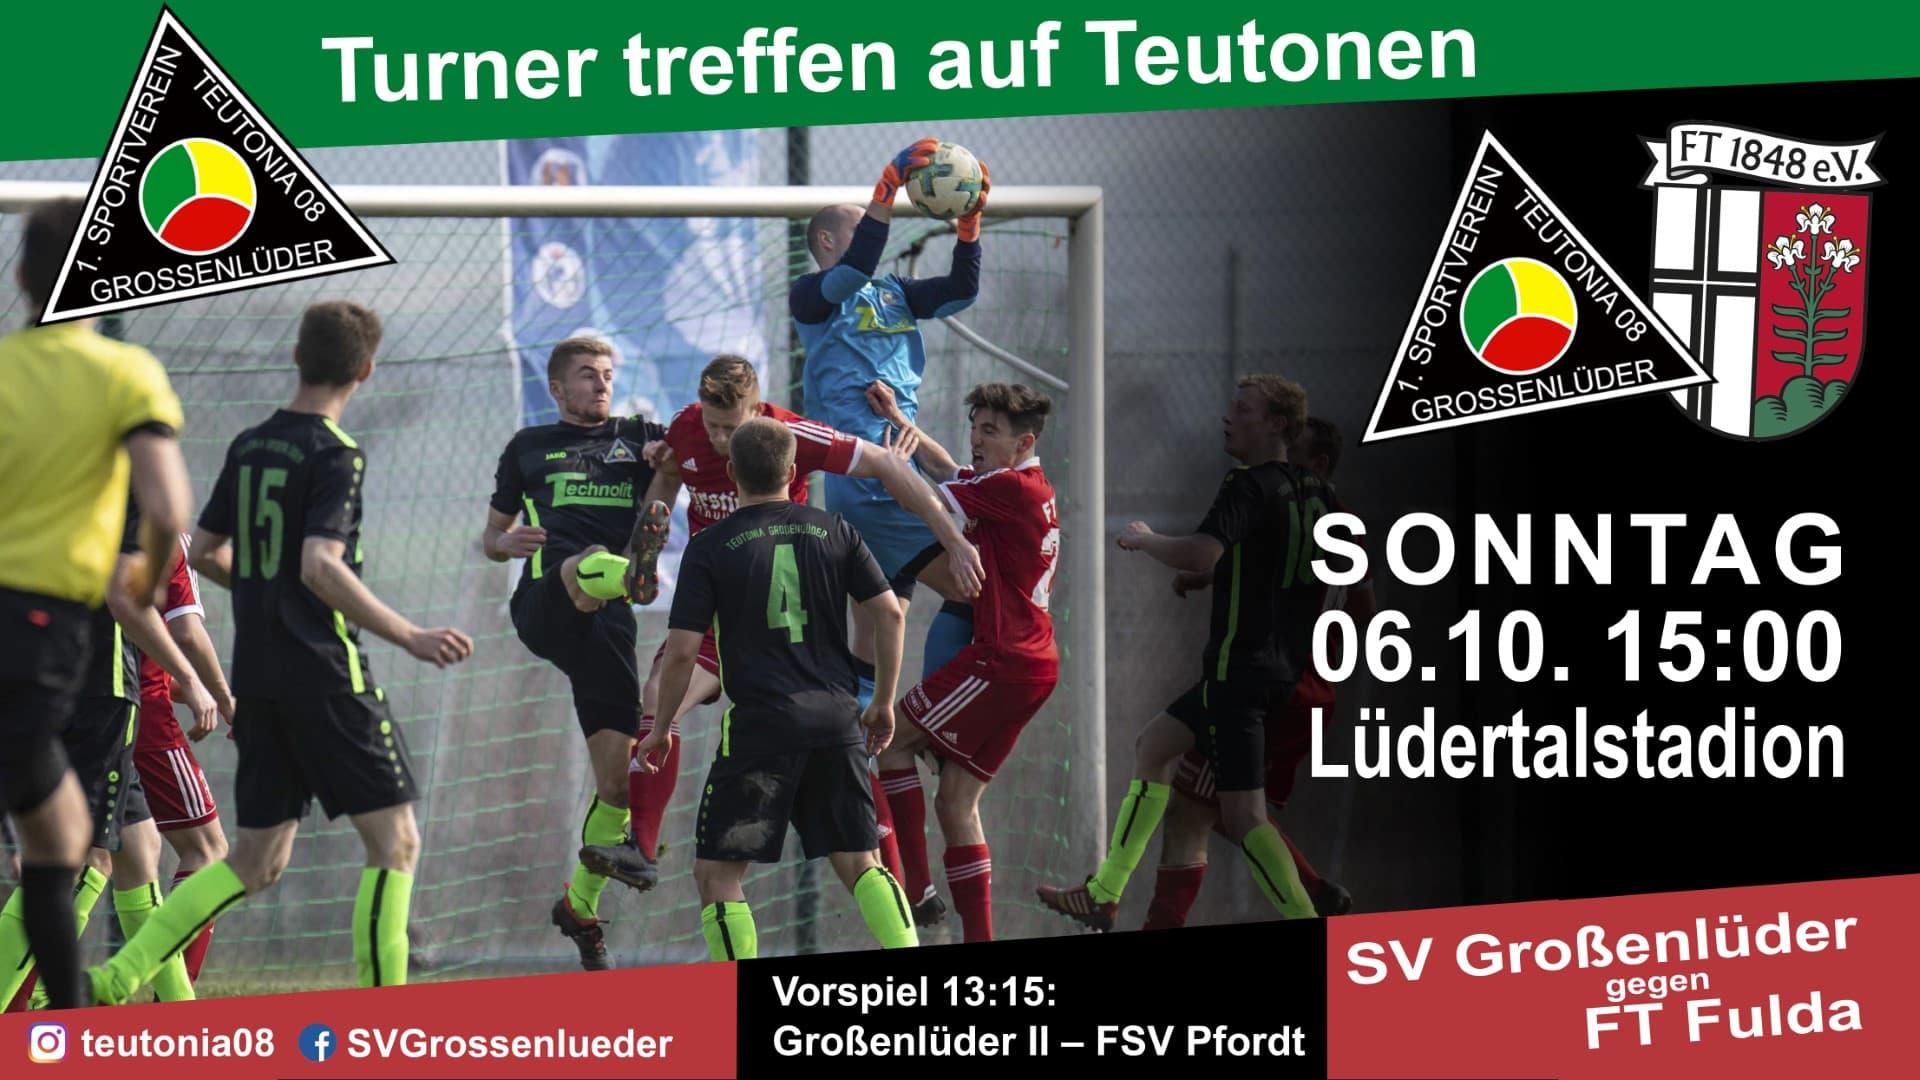 Heimspiel FT Fulda 2019